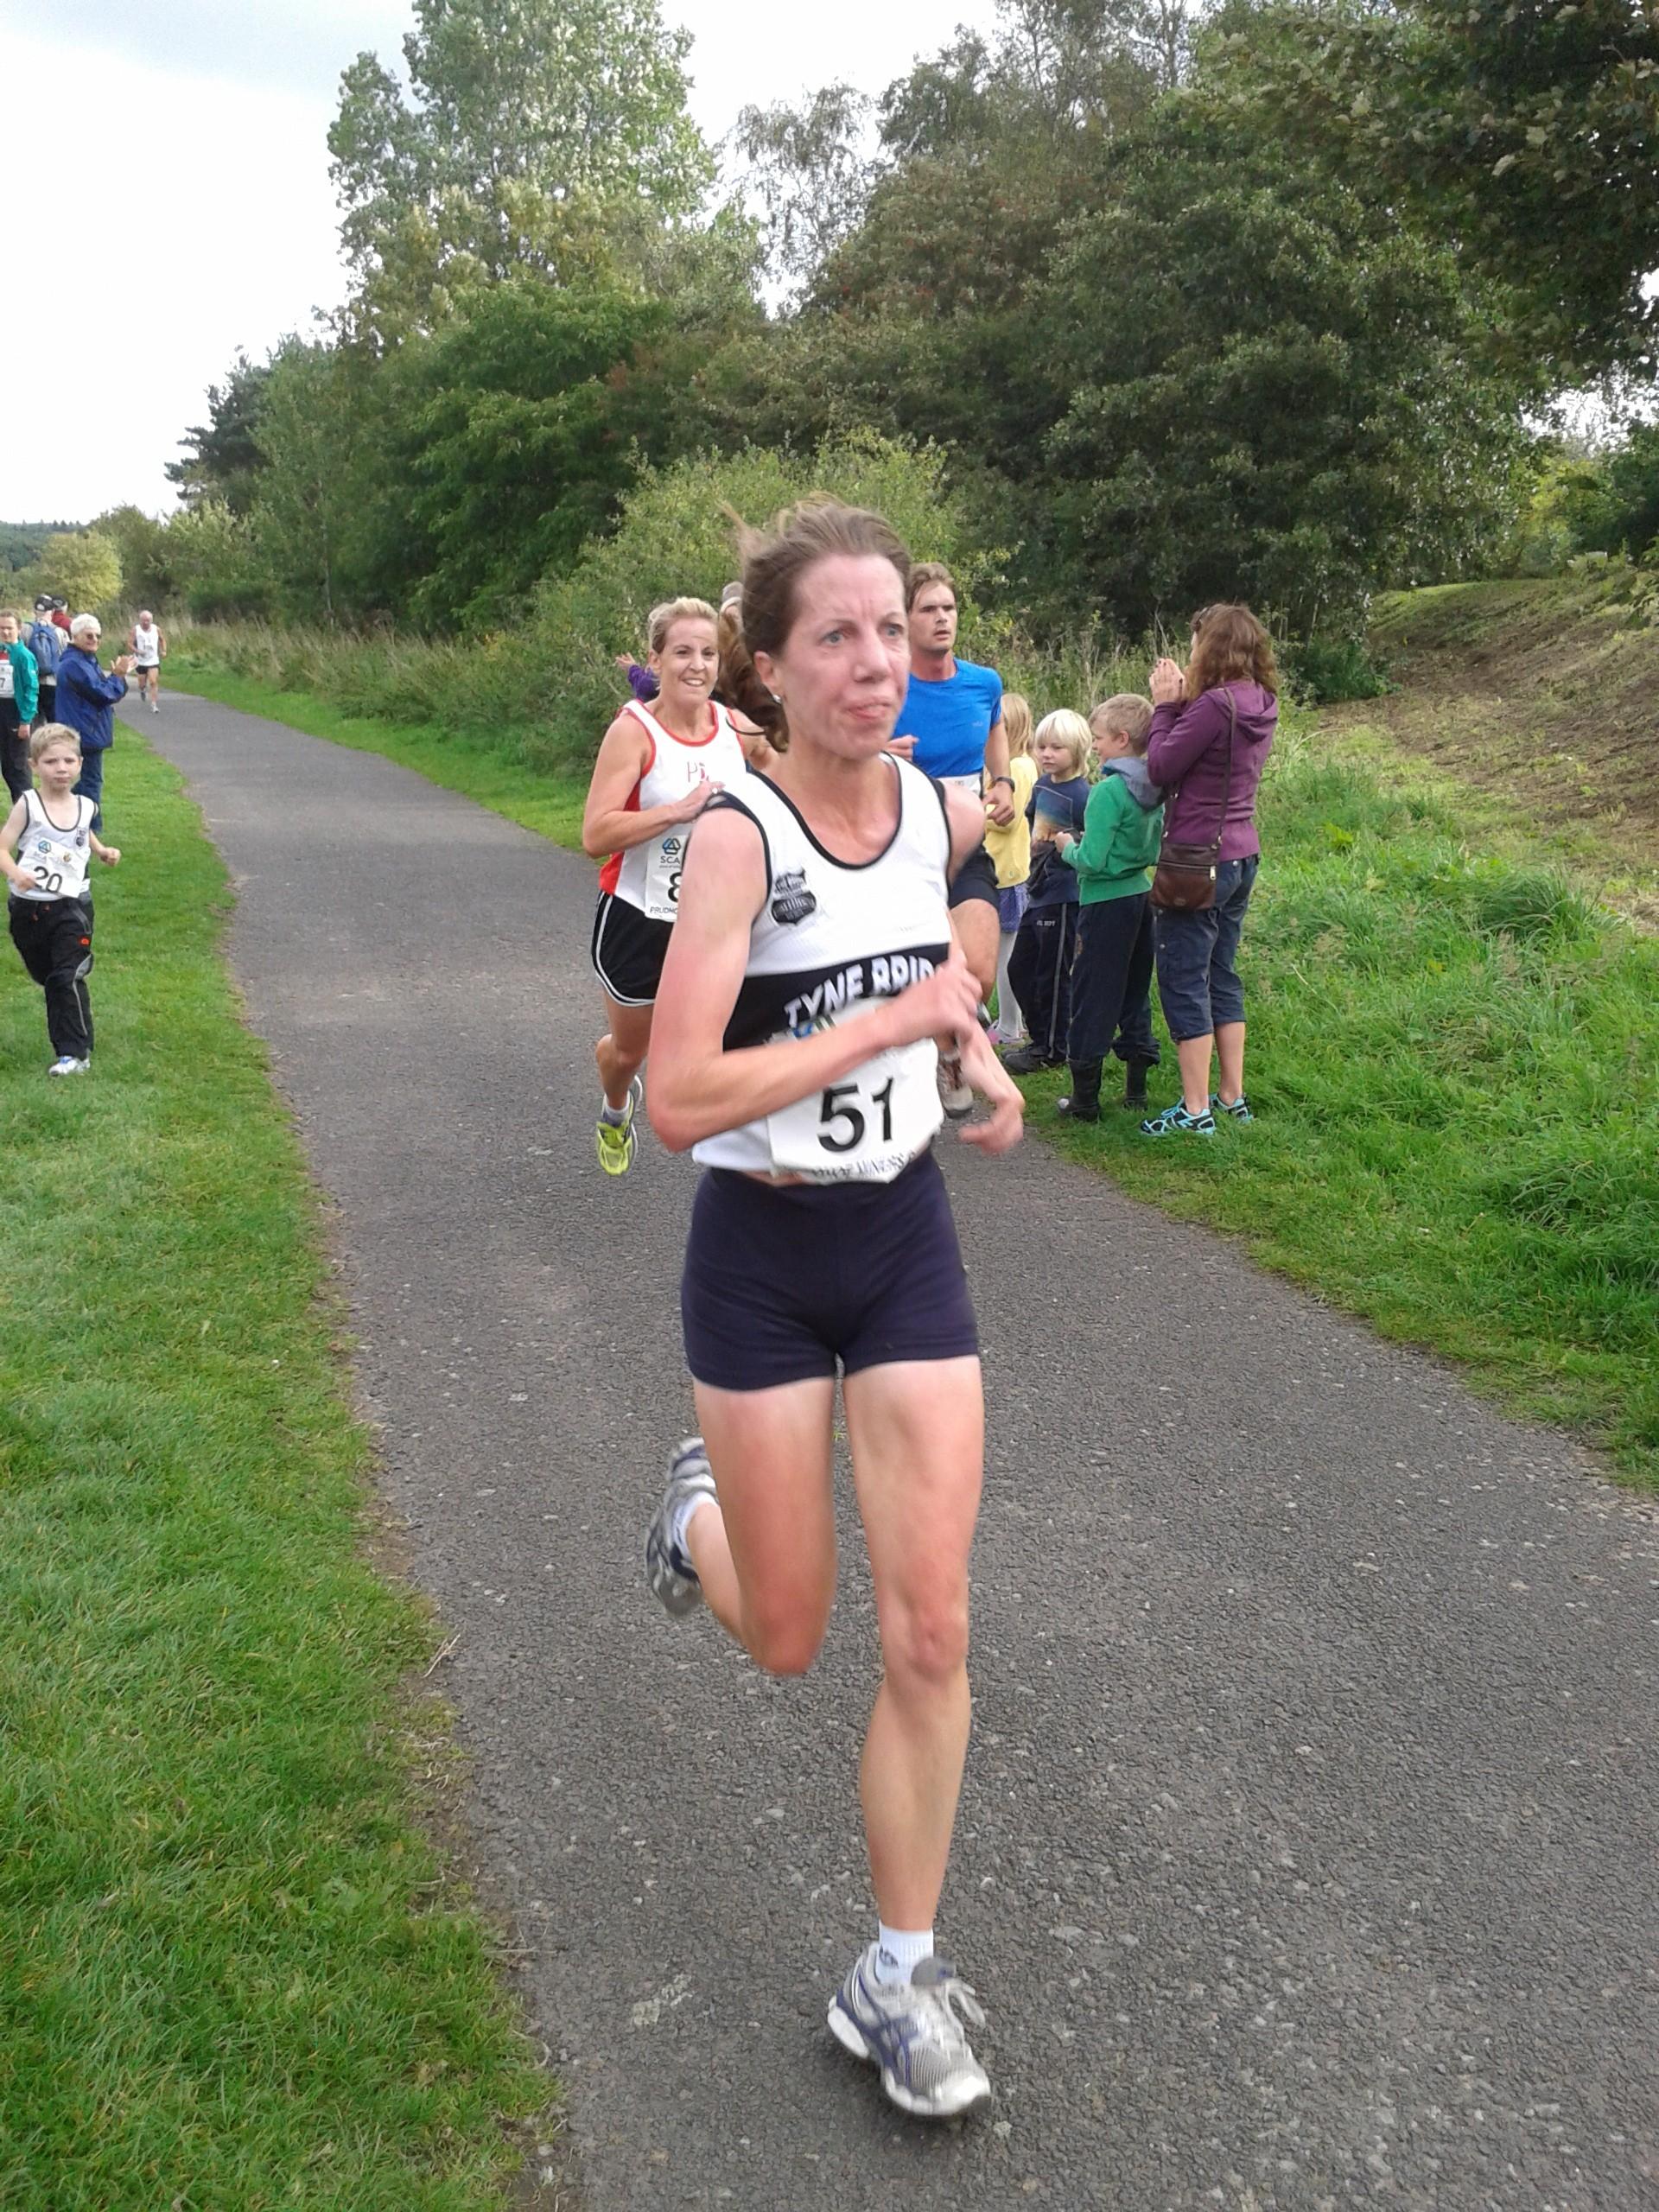 Emma Moir in action.